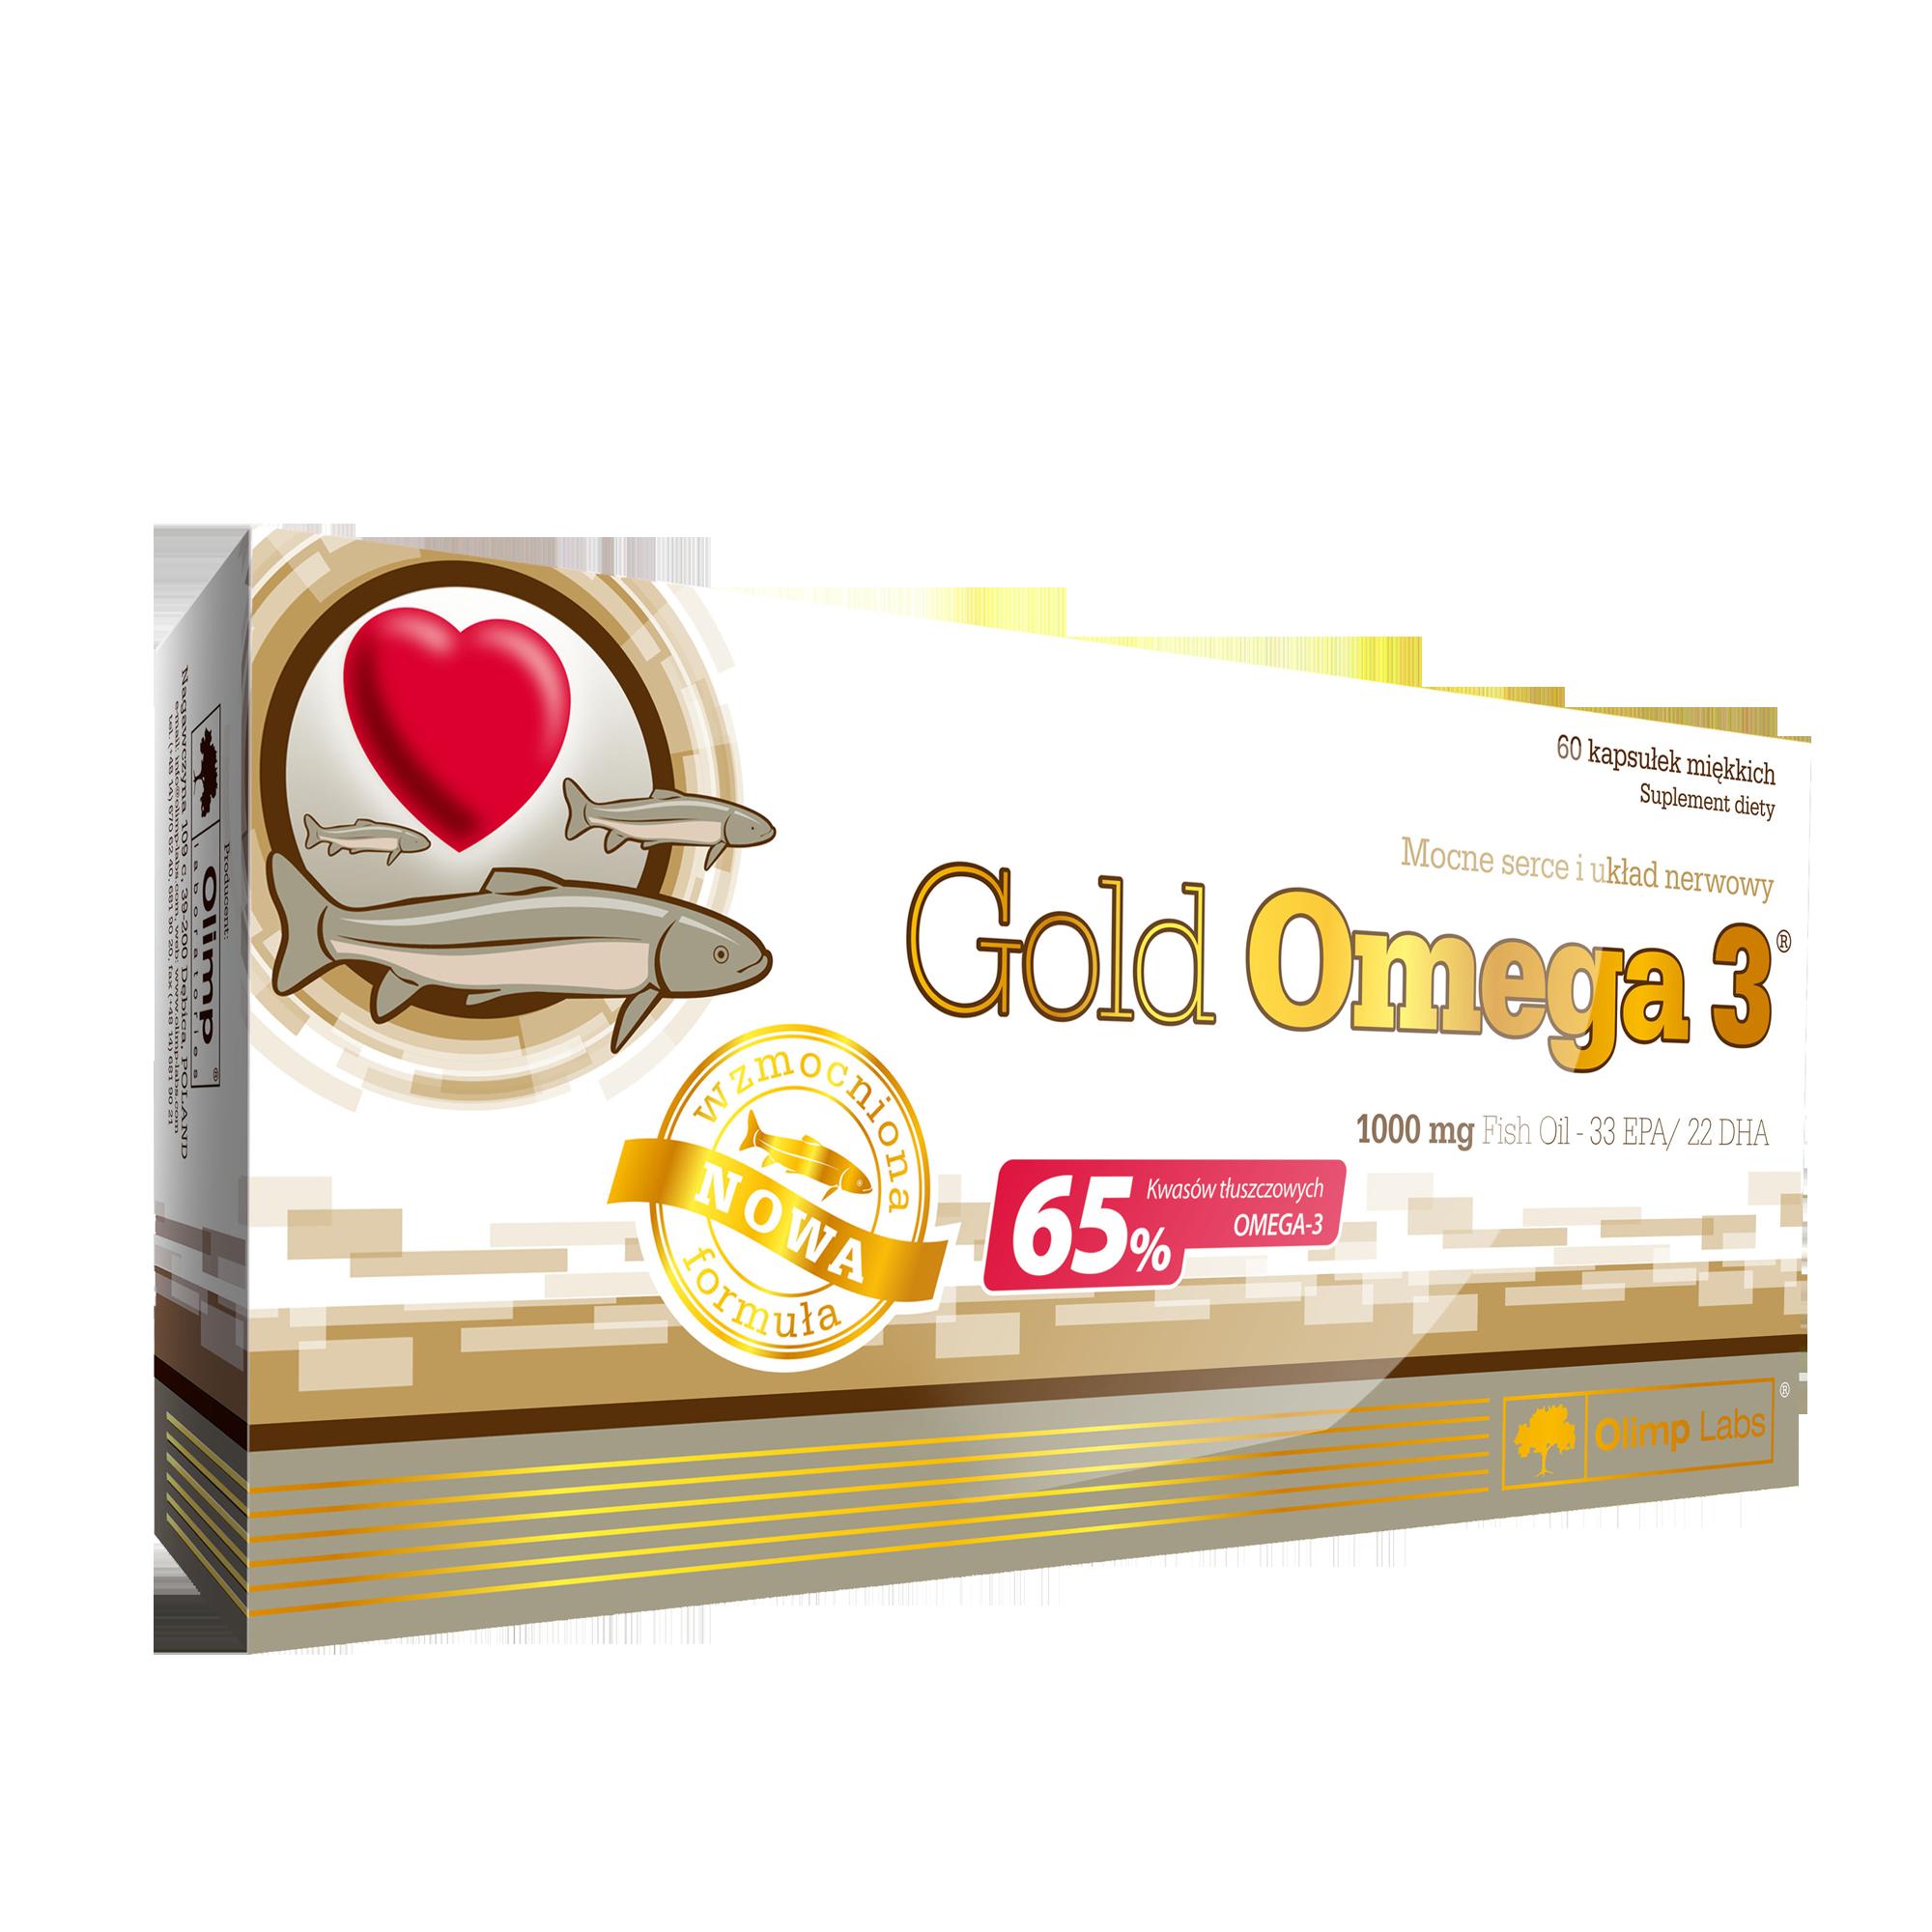 OLIMP Gold Omega 3 - 60 Kapseln